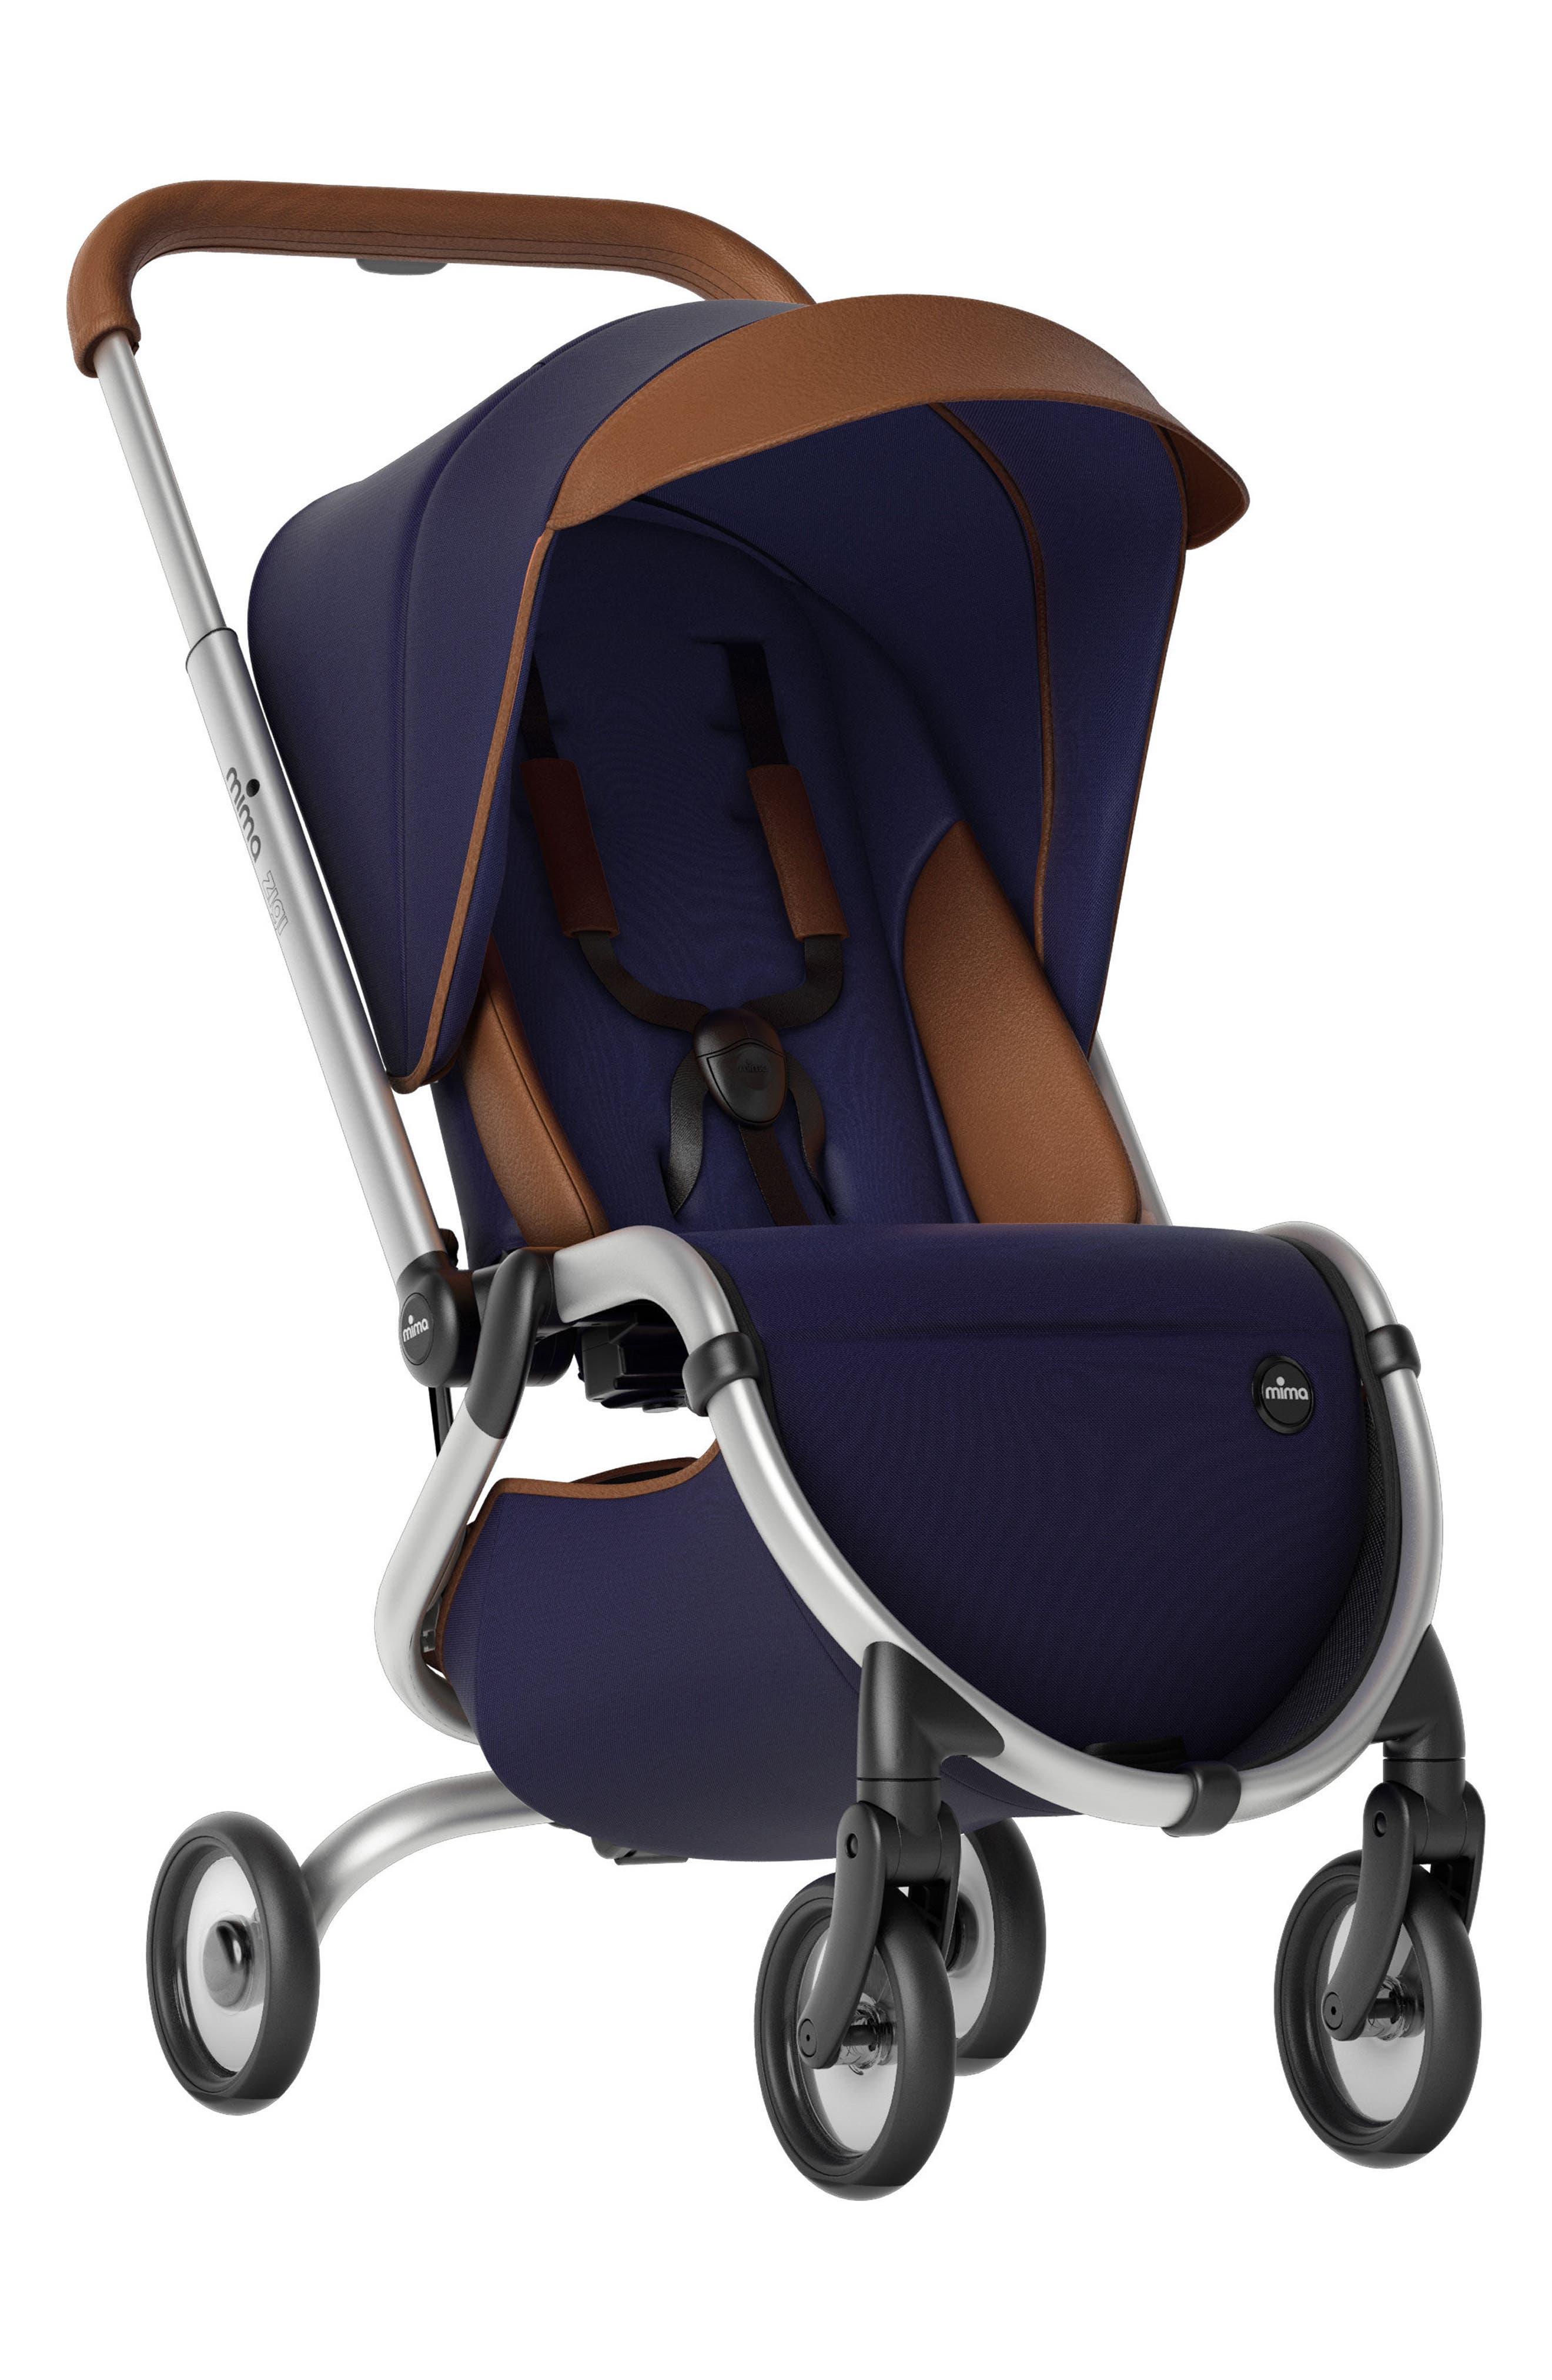 Alternate Image 1 Selected - Mima Zigi Travel Stroller